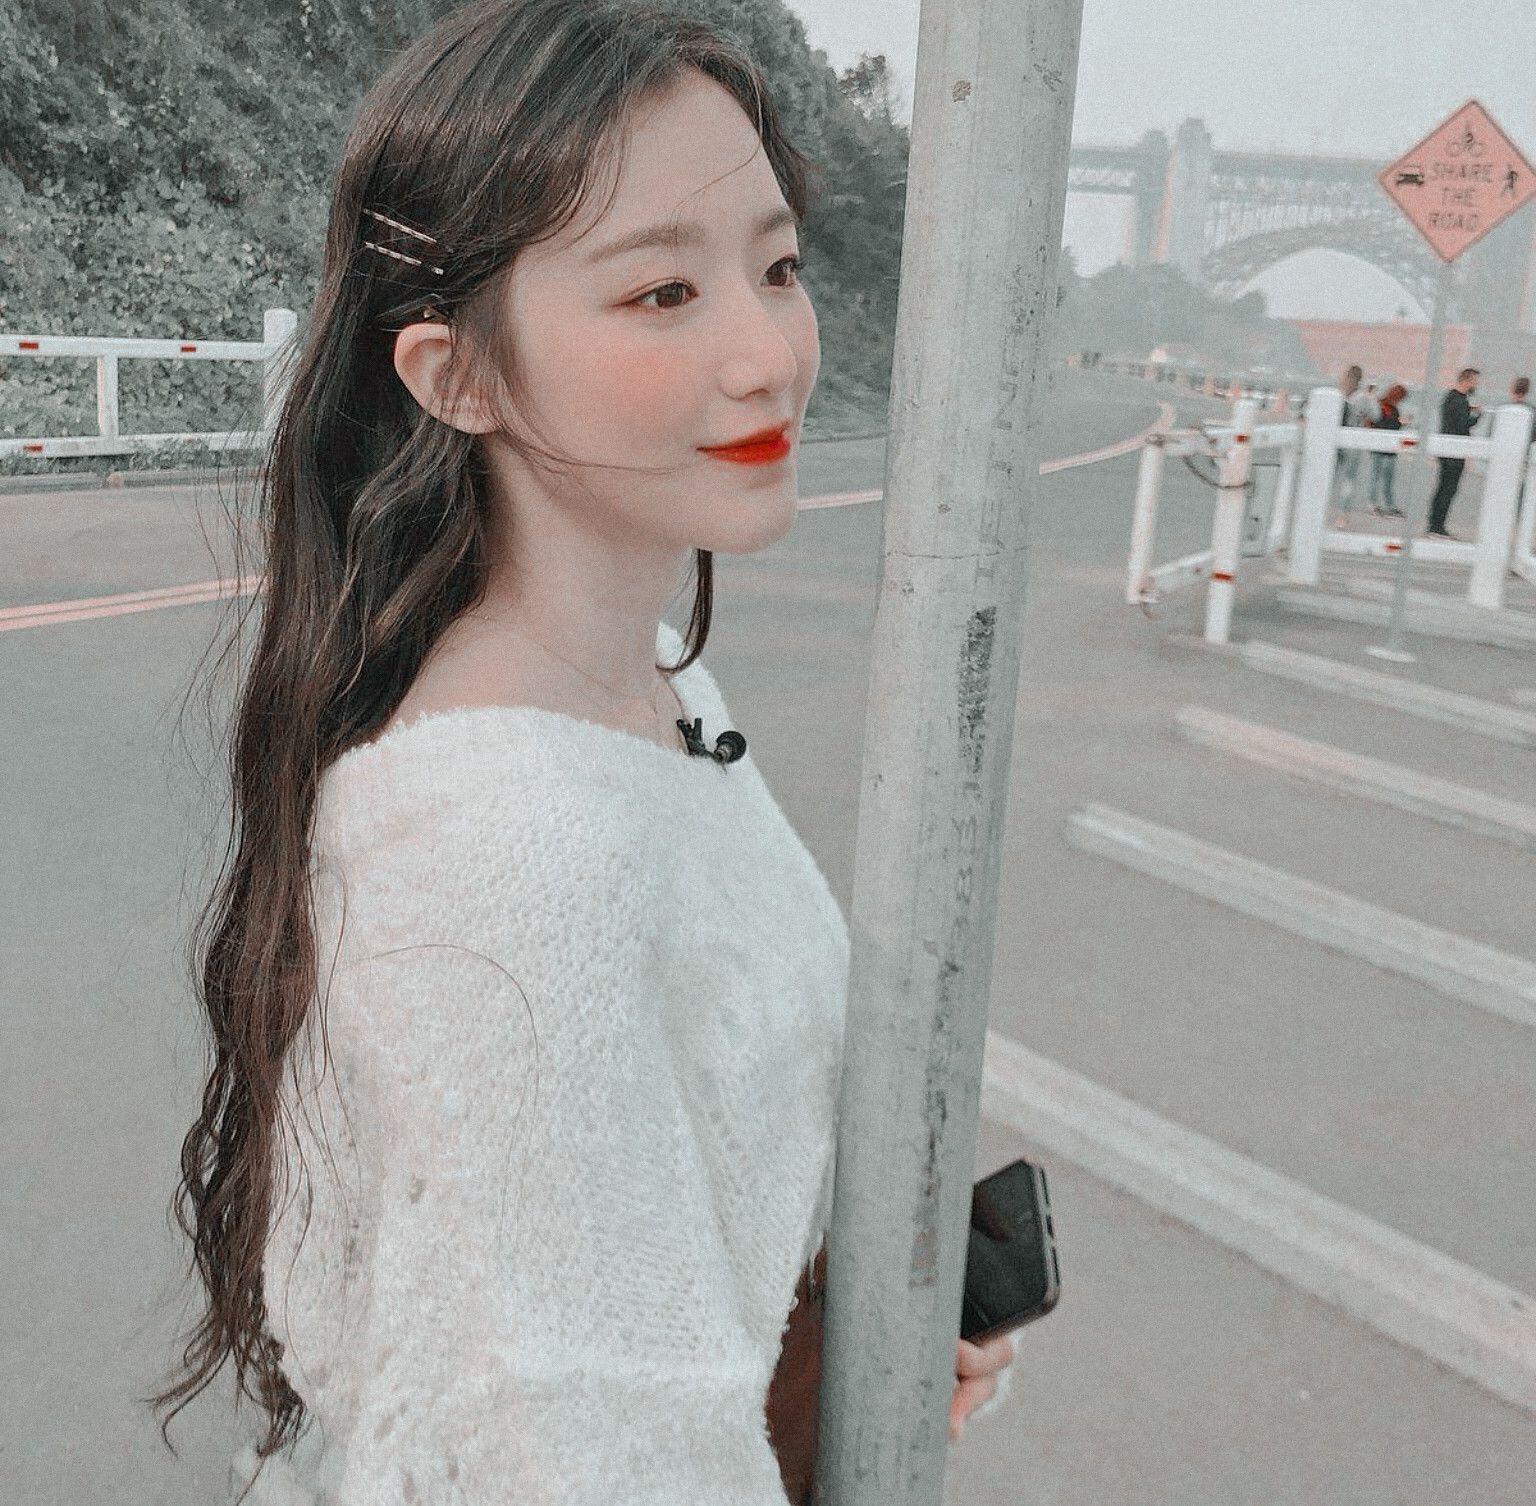 soyeon miyeon minnie soojin yuqi shuhua gidle idle g idle aesthetics aesthetic cute soft pastel kawaii aesthetic g-idle aesthetic kpop kfashion ...